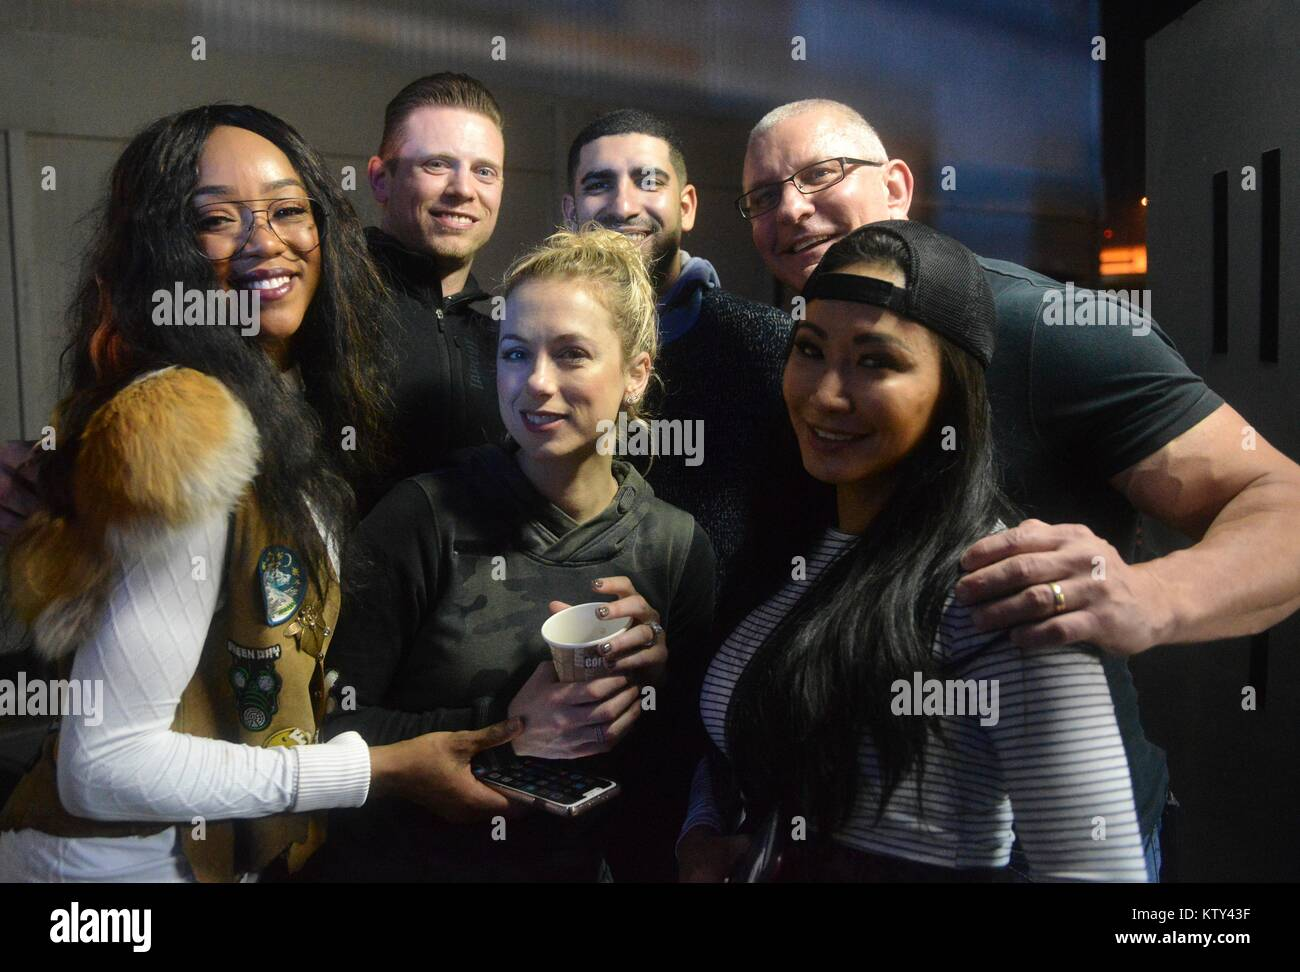 World Wrestling Entertainment (WWE) wrestlers (back, L-R) Alicia Fox, The Miz (Michael Mizanin), U.S. Army Medal - Stock Image